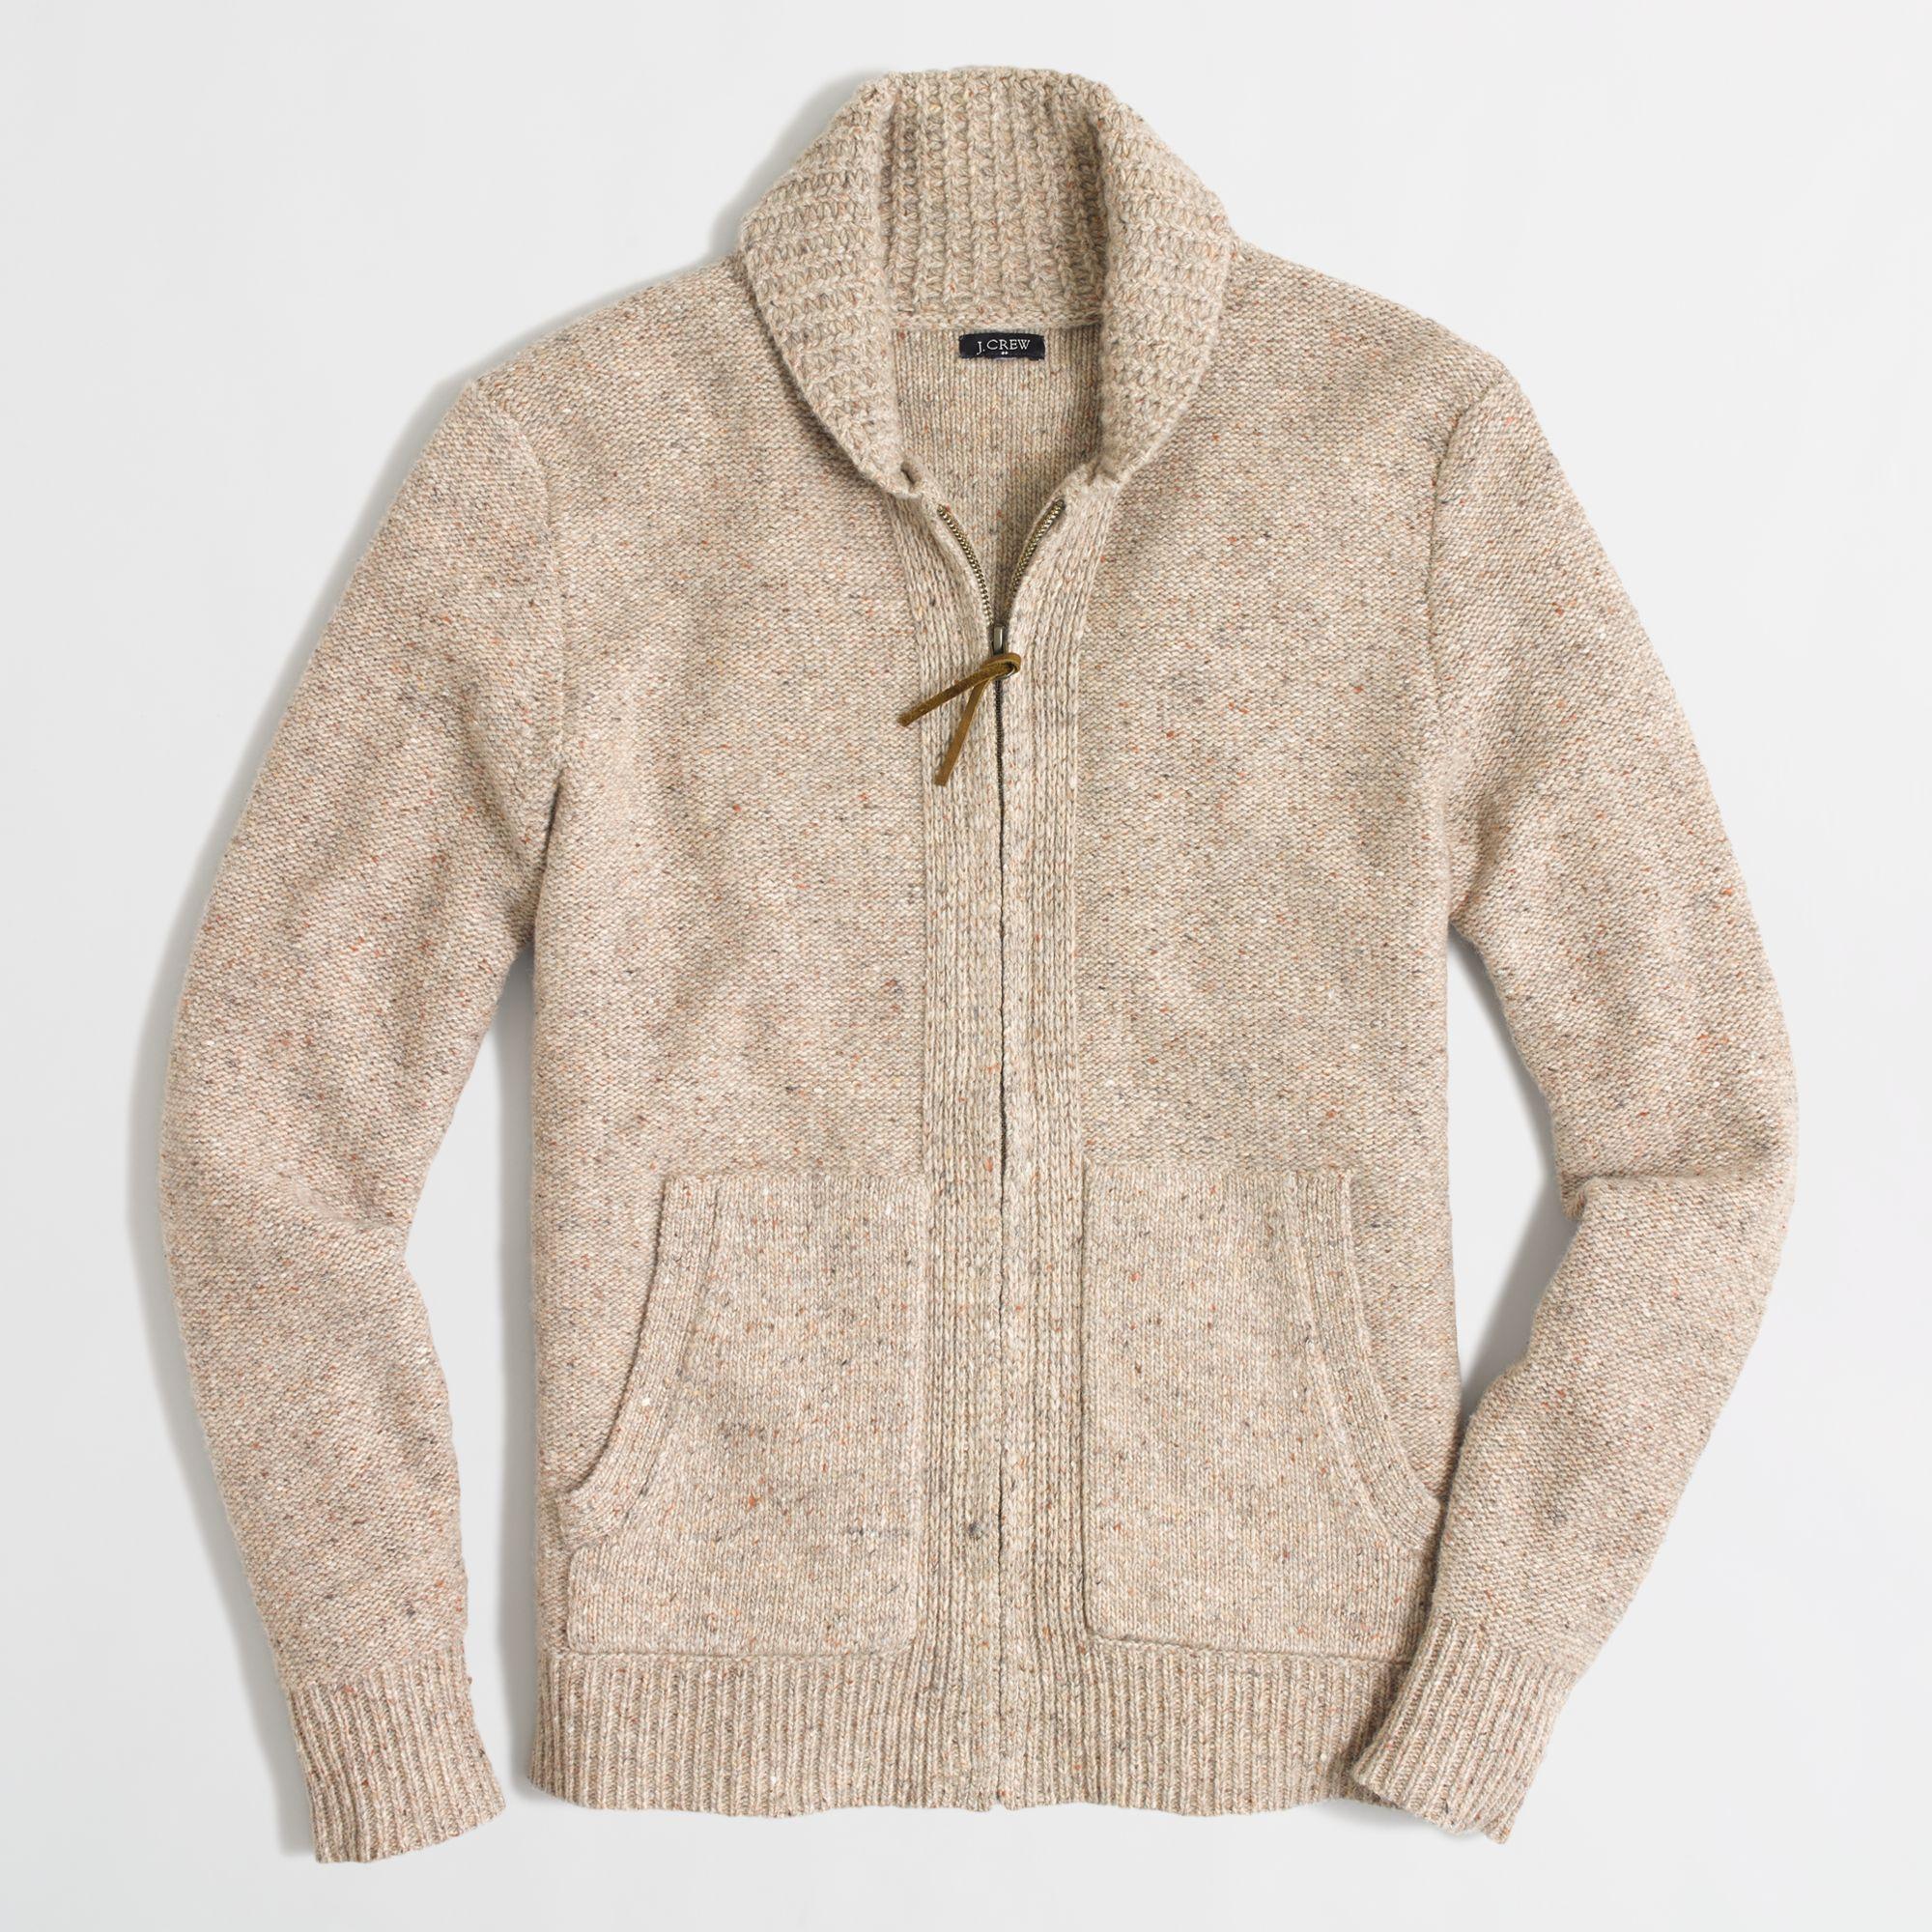 J.crew Factory Donegal Full-zip Cardigan in Natural for Men | Lyst